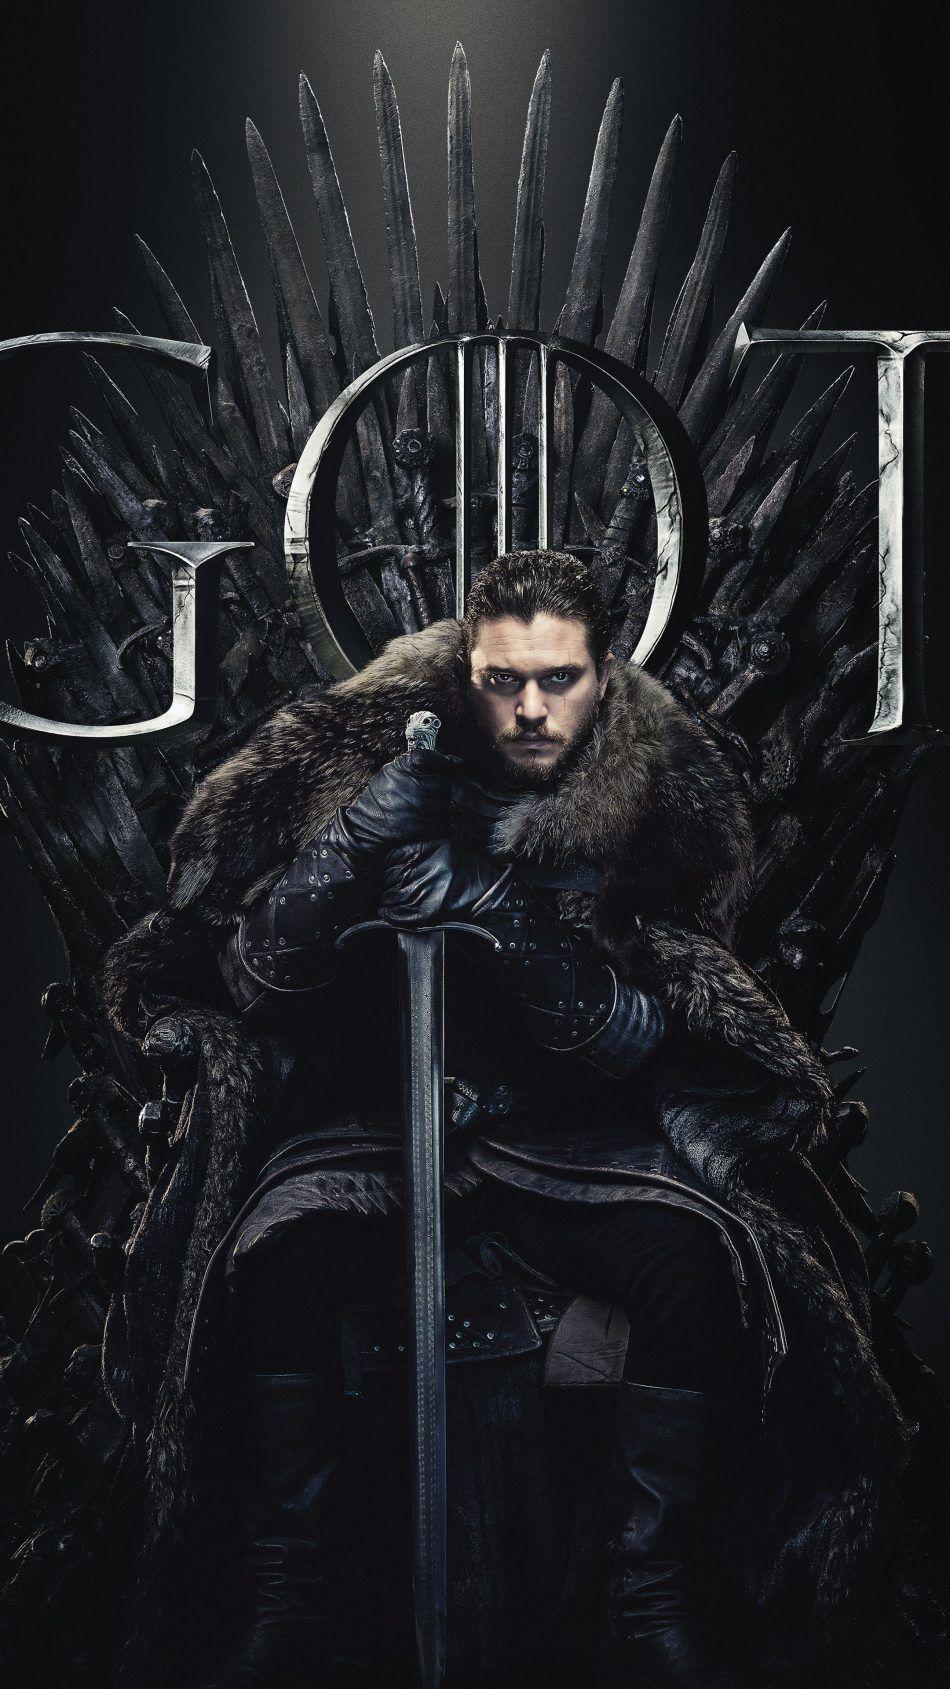 Got Gameofthrones Series Game Of Thrones Poster Jon Snow Aesthetic Jon Snow Art